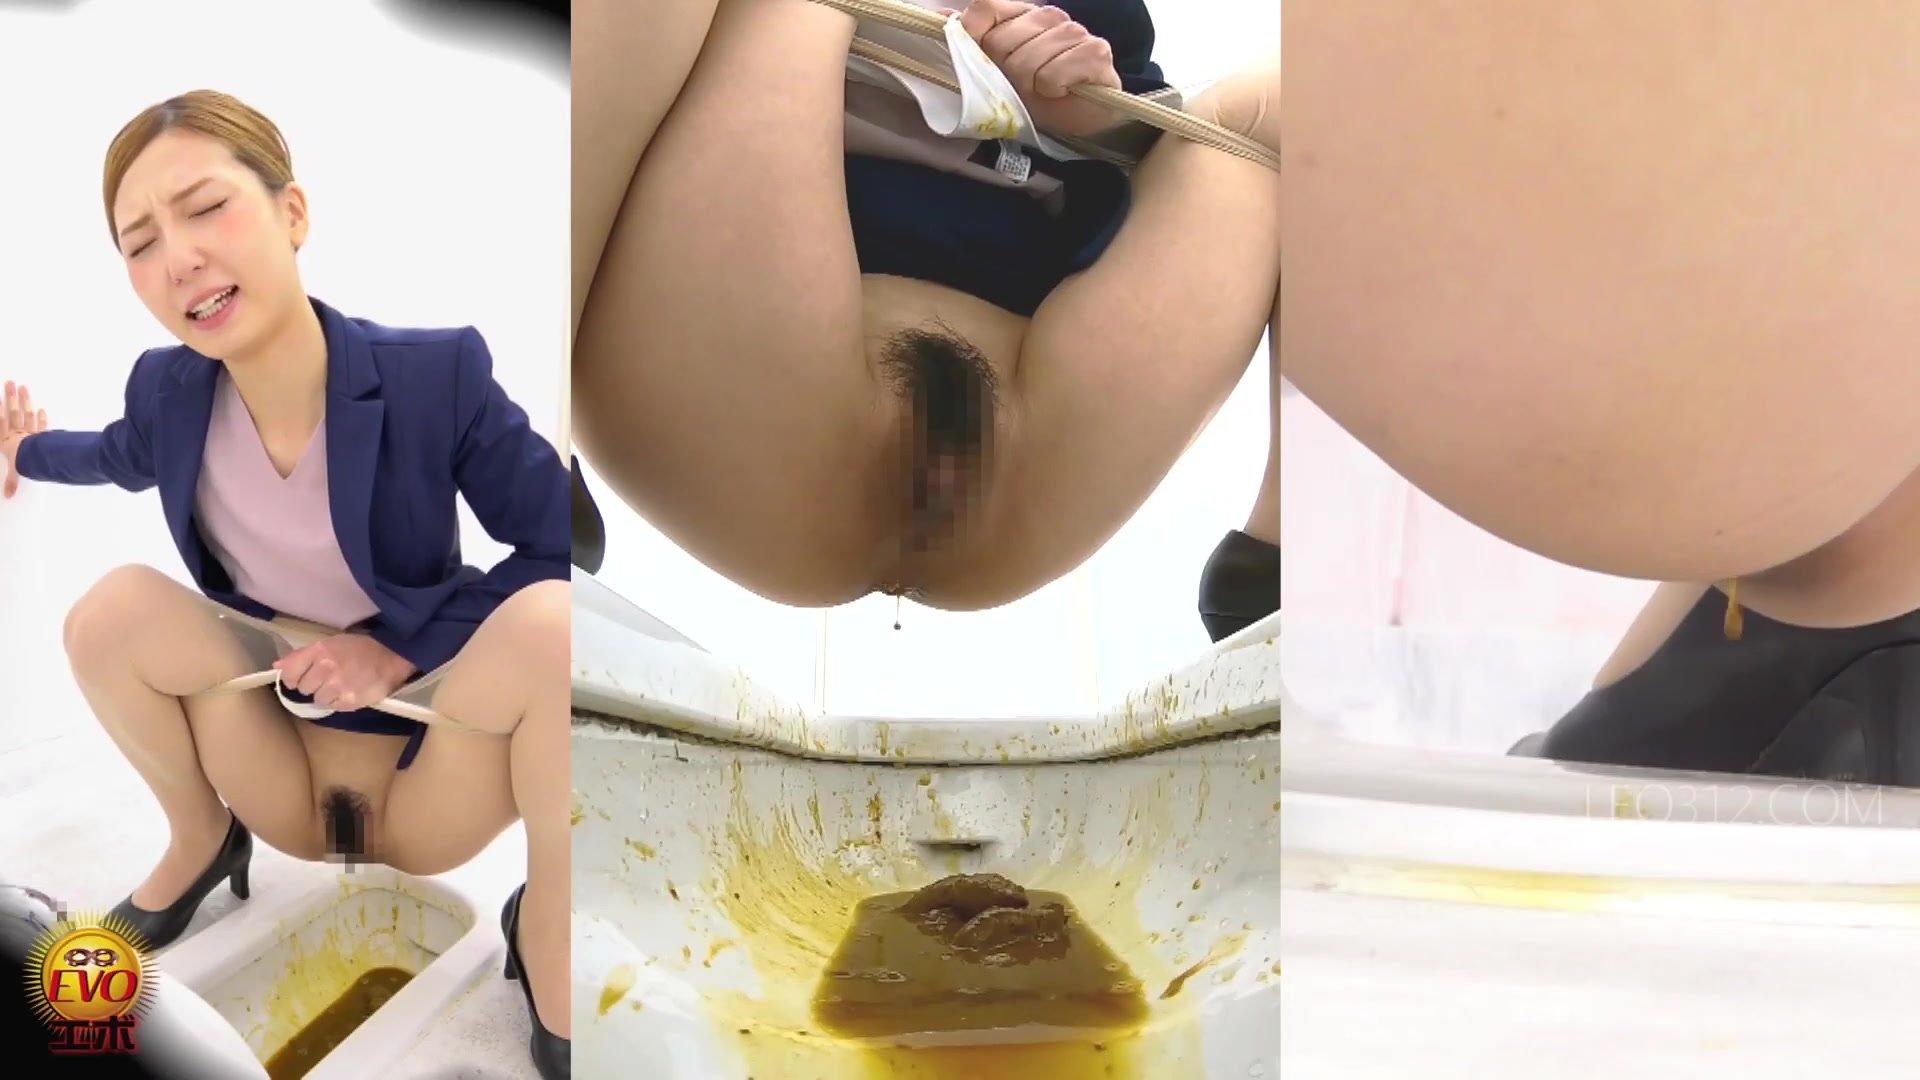 Toilet shit pussy free sex pics